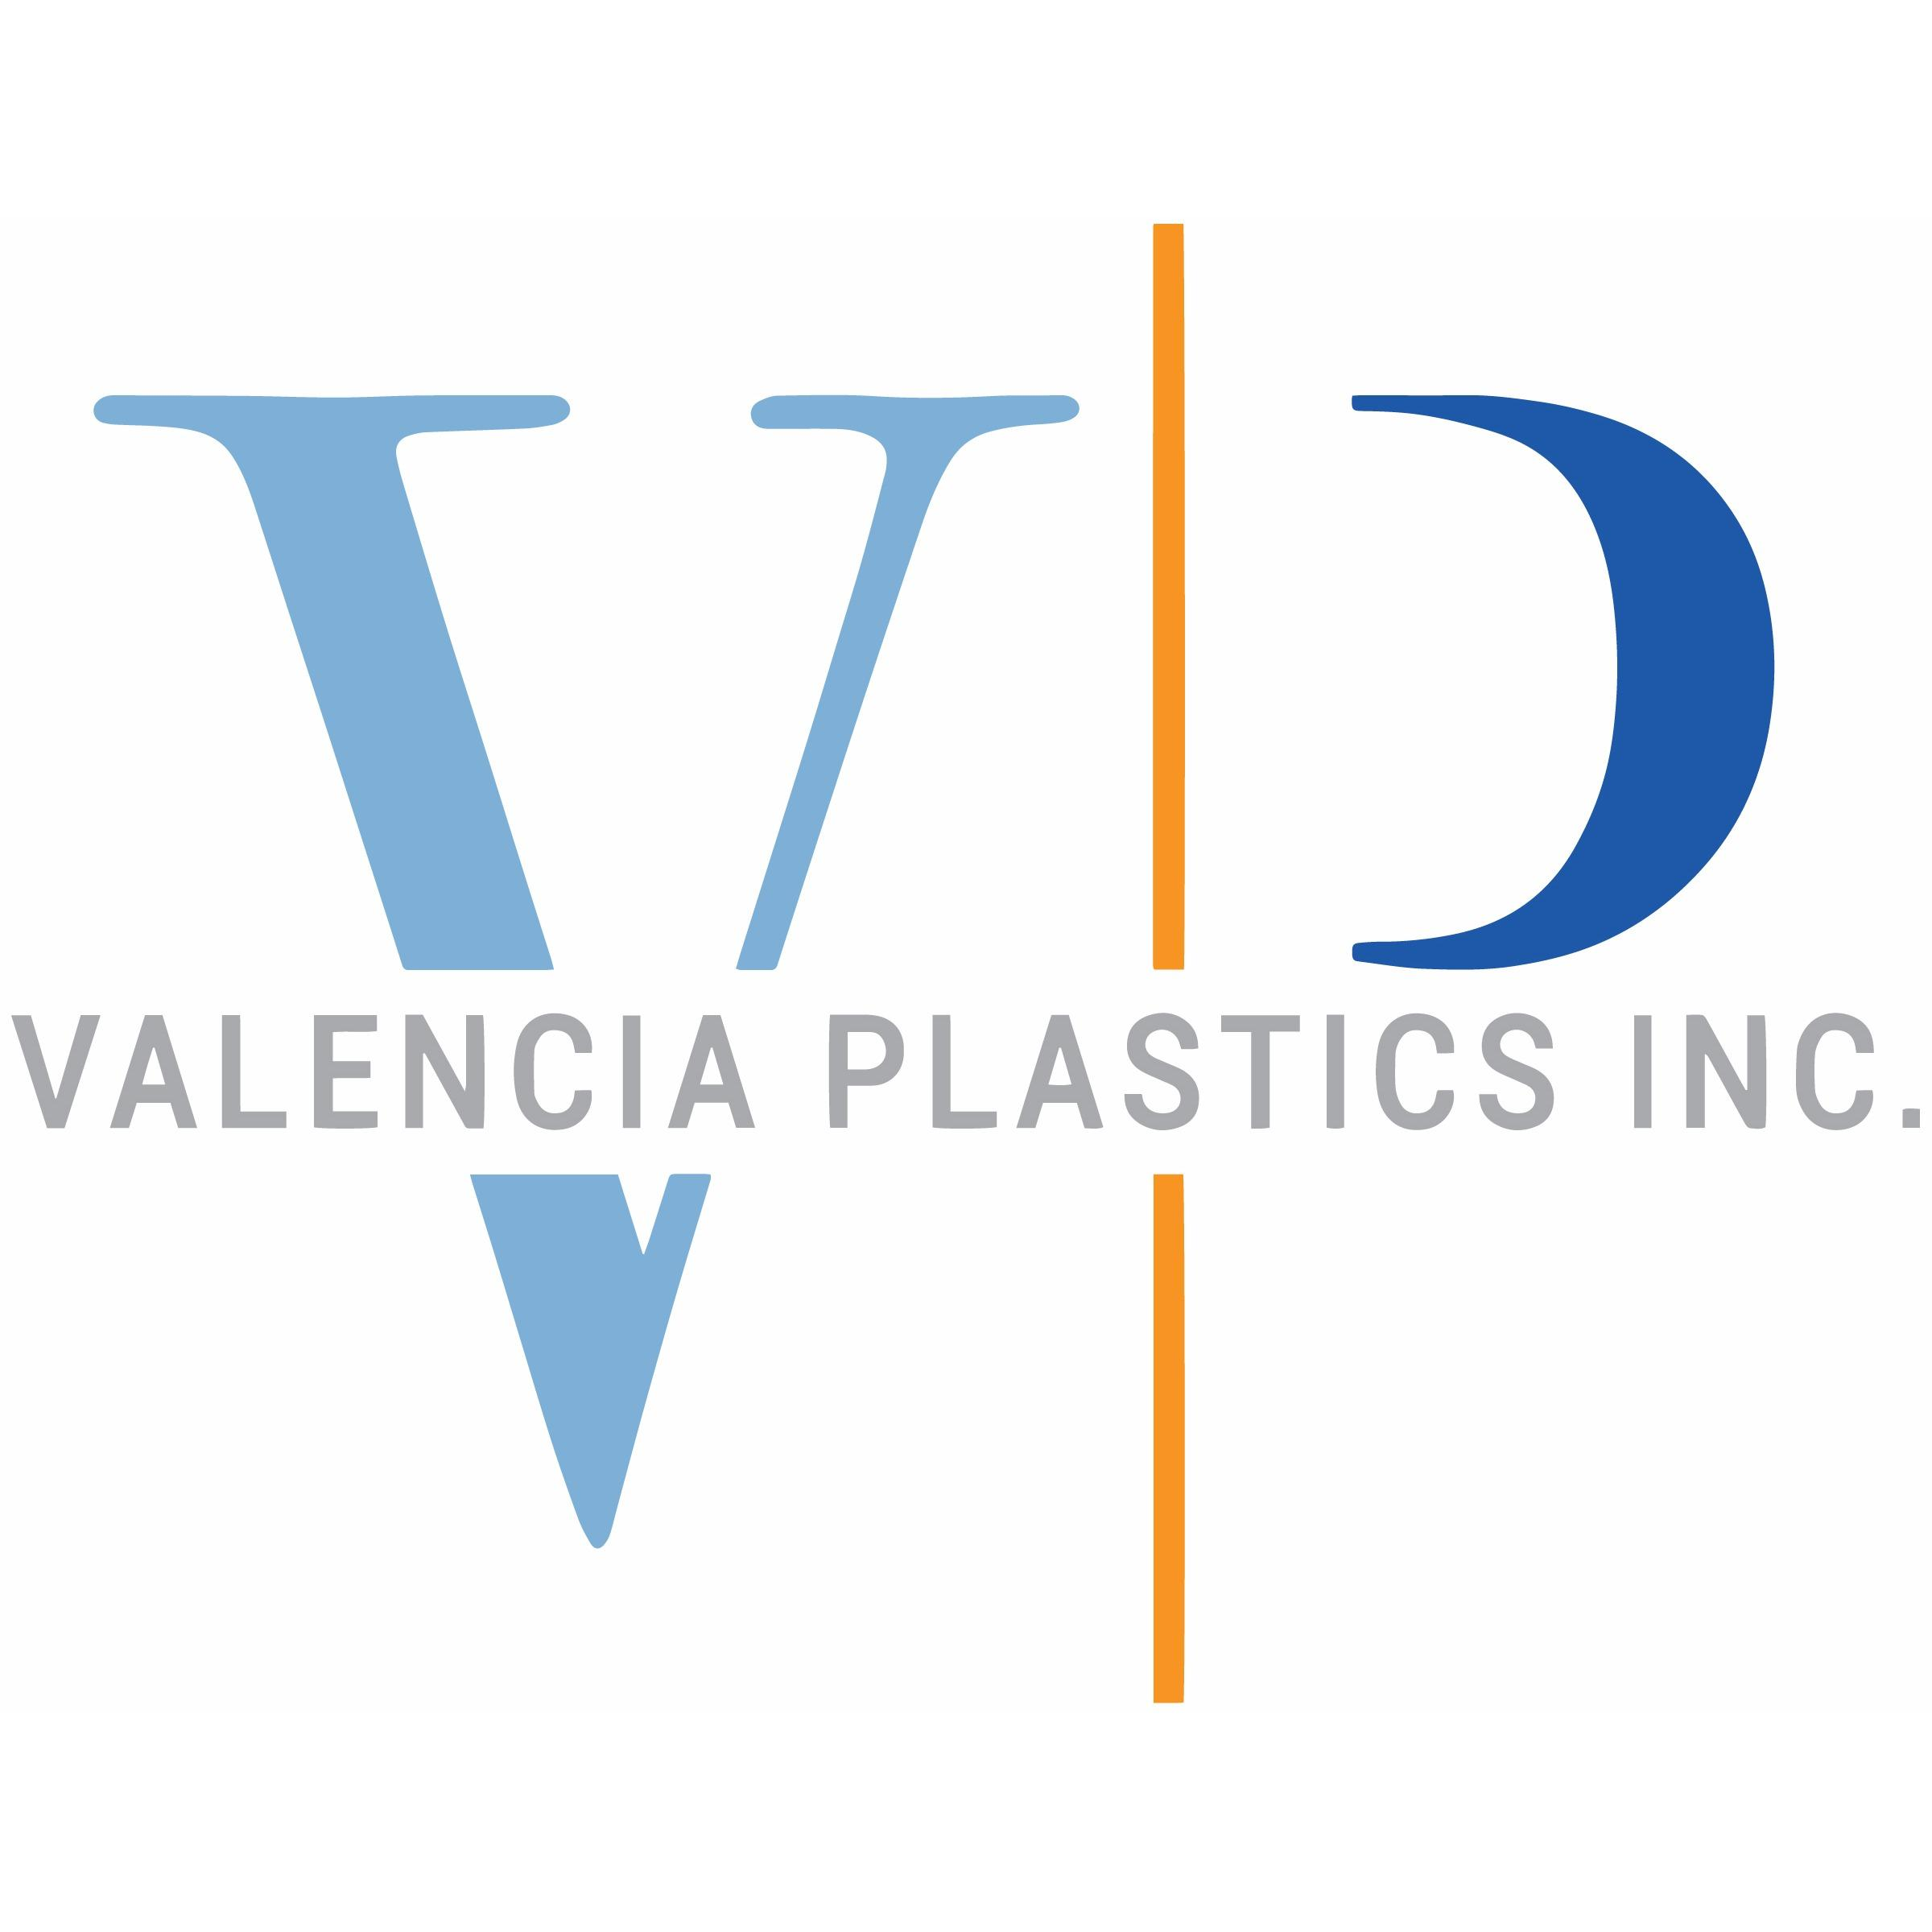 Valencia Plastics